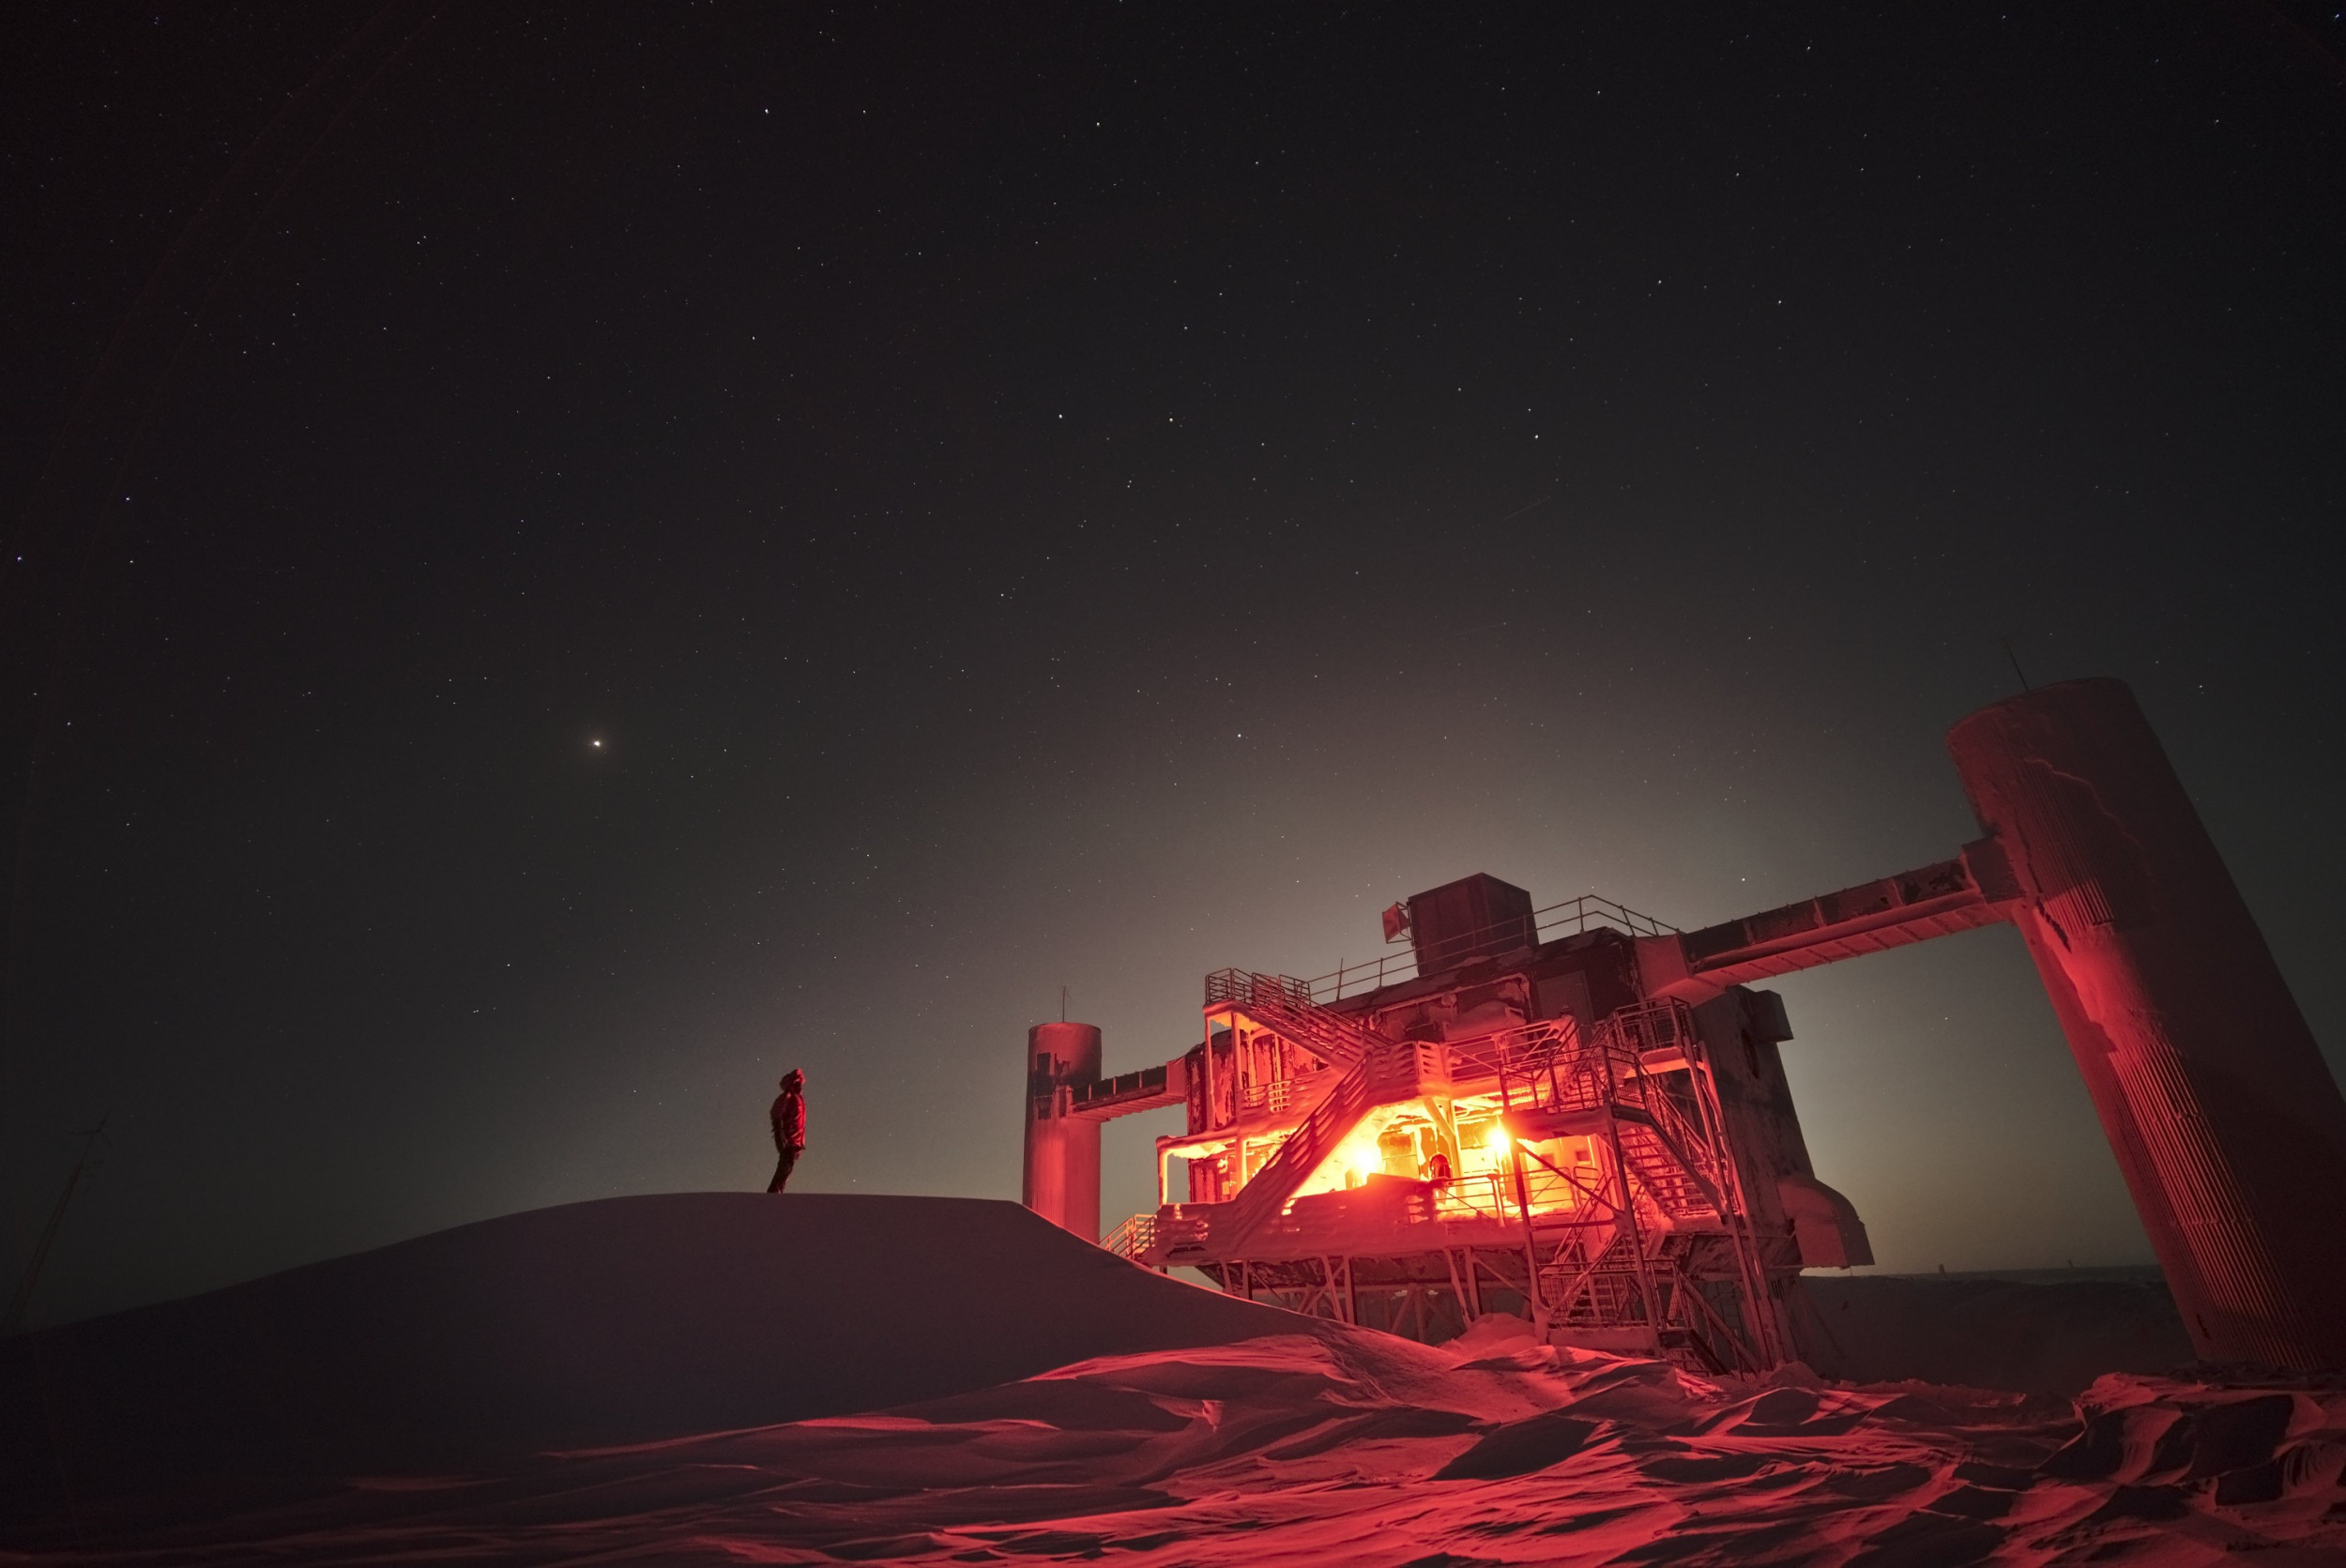 IceCube Neutrino: Observatory That Hunts Most Elusive ...Icecube Neutrino Observatory Core